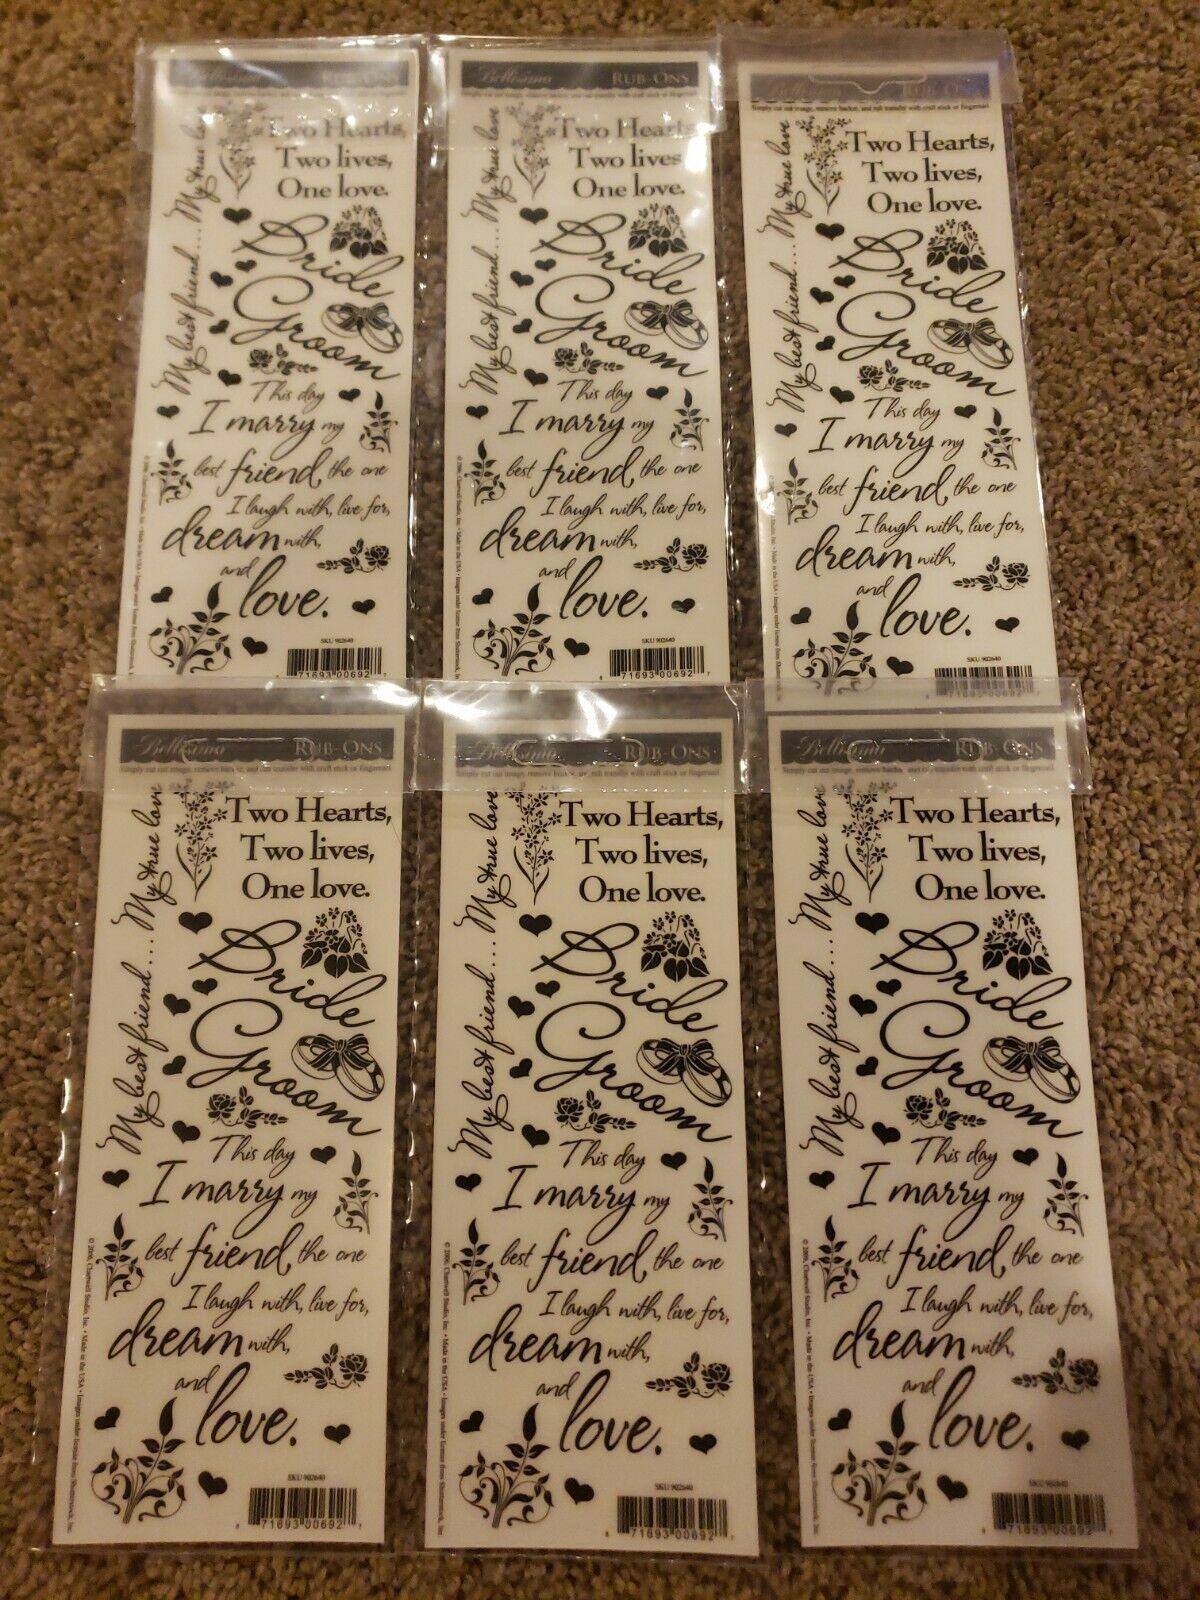 WEDDING Love Rub On Scrapbooking Transfers 6 sheets Verse Words Flowers Hearts